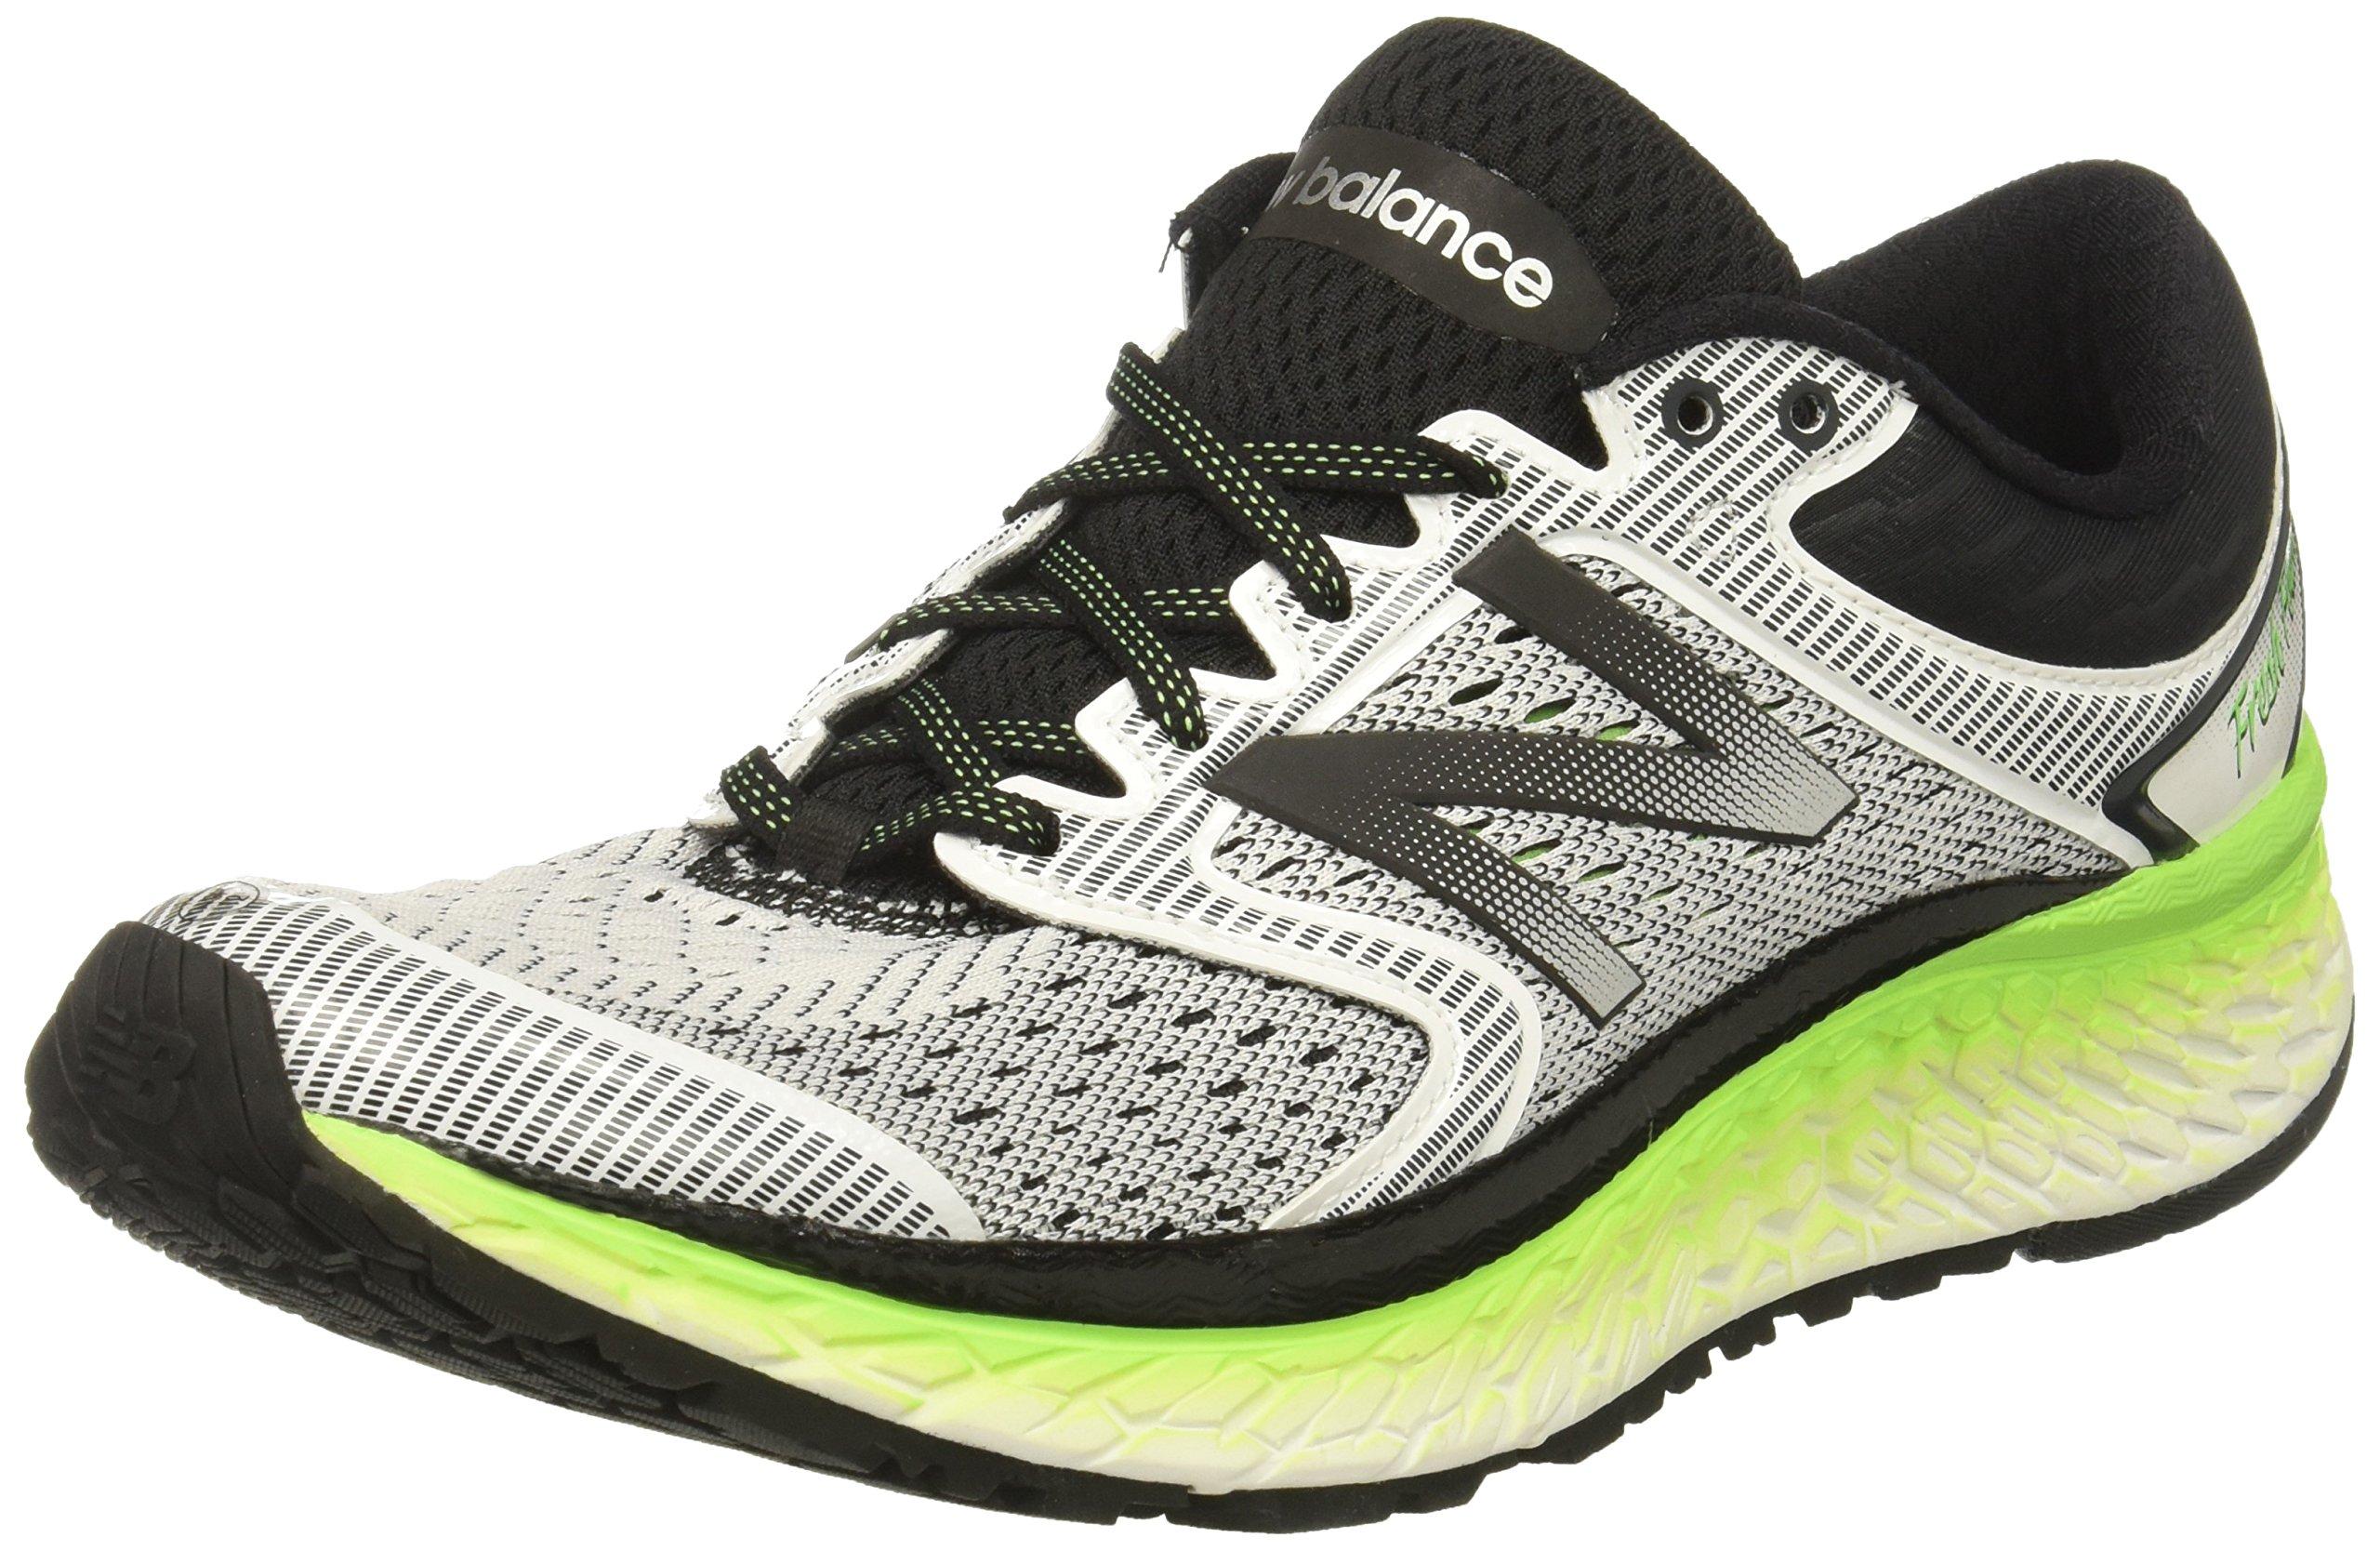 New Balance Men's 1080V7 Running-Shoes, White/Energy Lime, 14 D US by New Balance